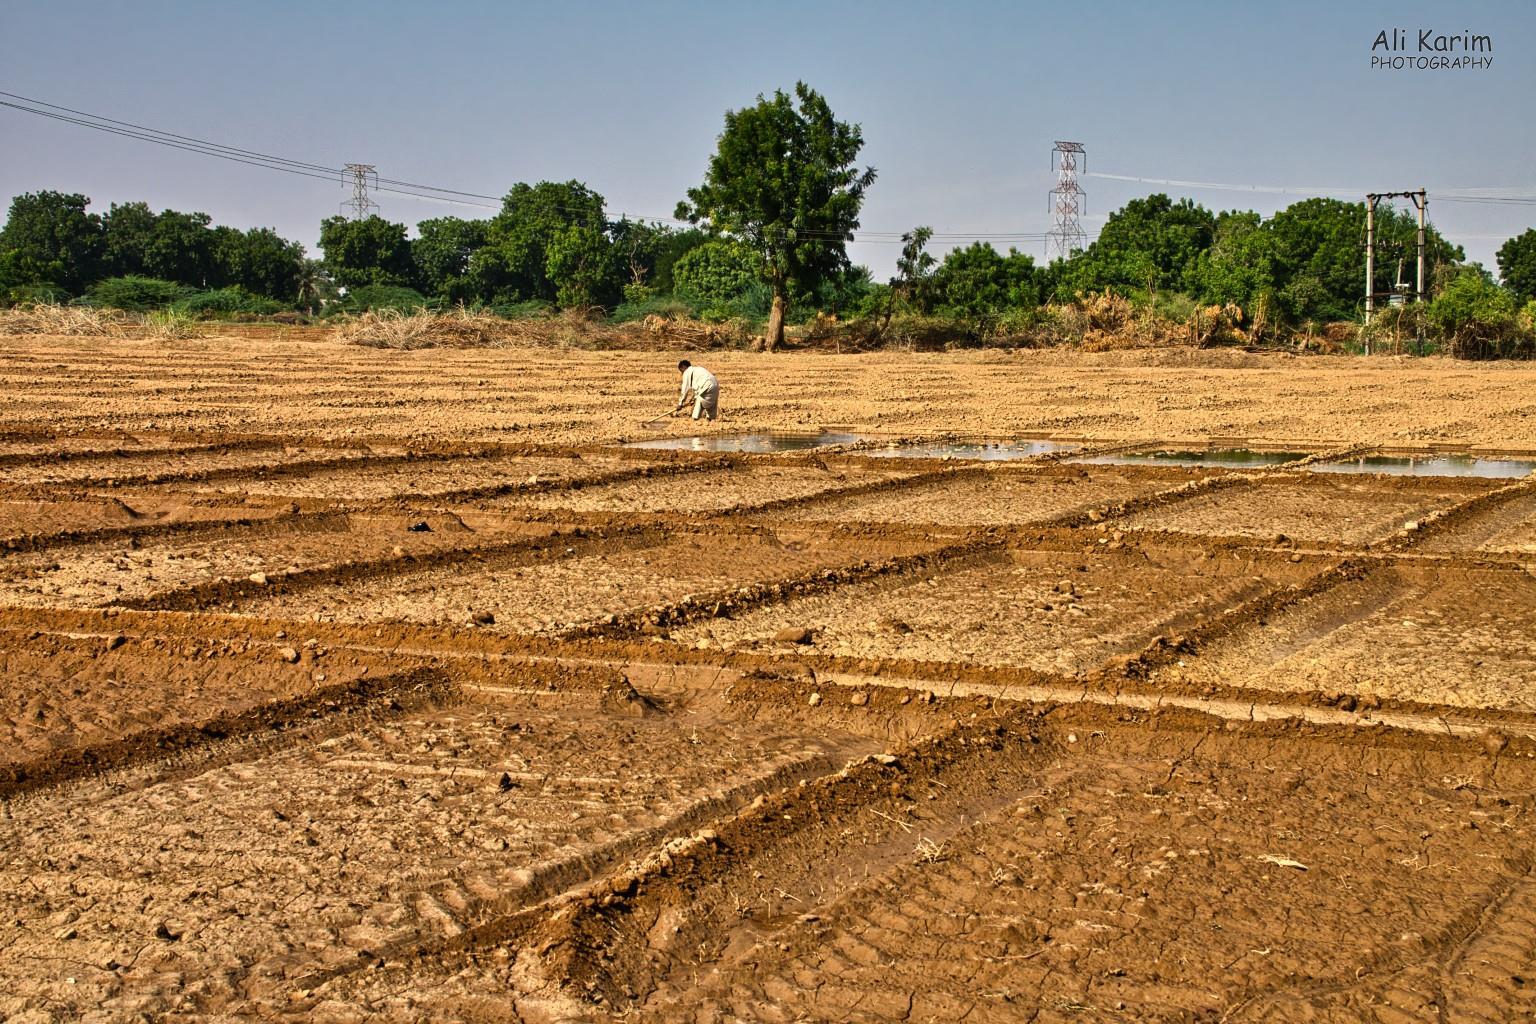 Bhuj, Kutch, Gujarat Crop farming